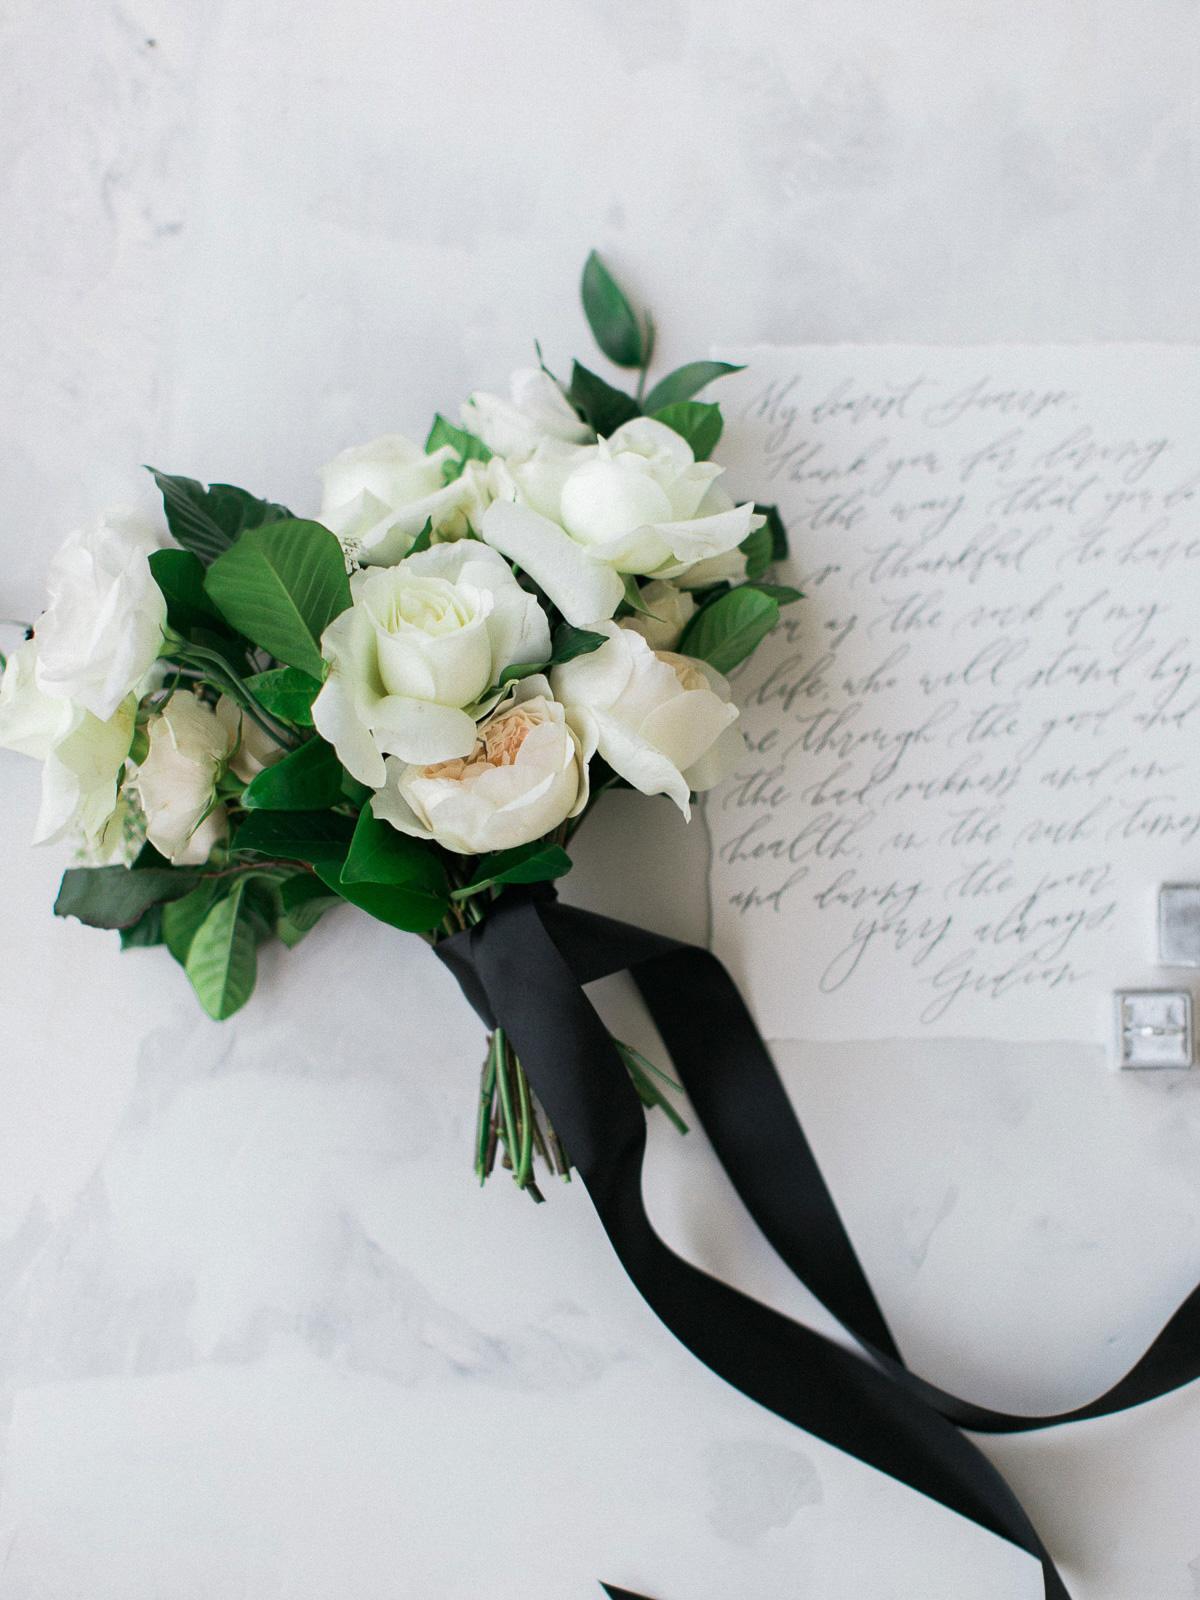 kurtz-orpia-photography-vineyard-bride-swish-list-dundurn-castle-dundas-wedding-editorial-8.jpg